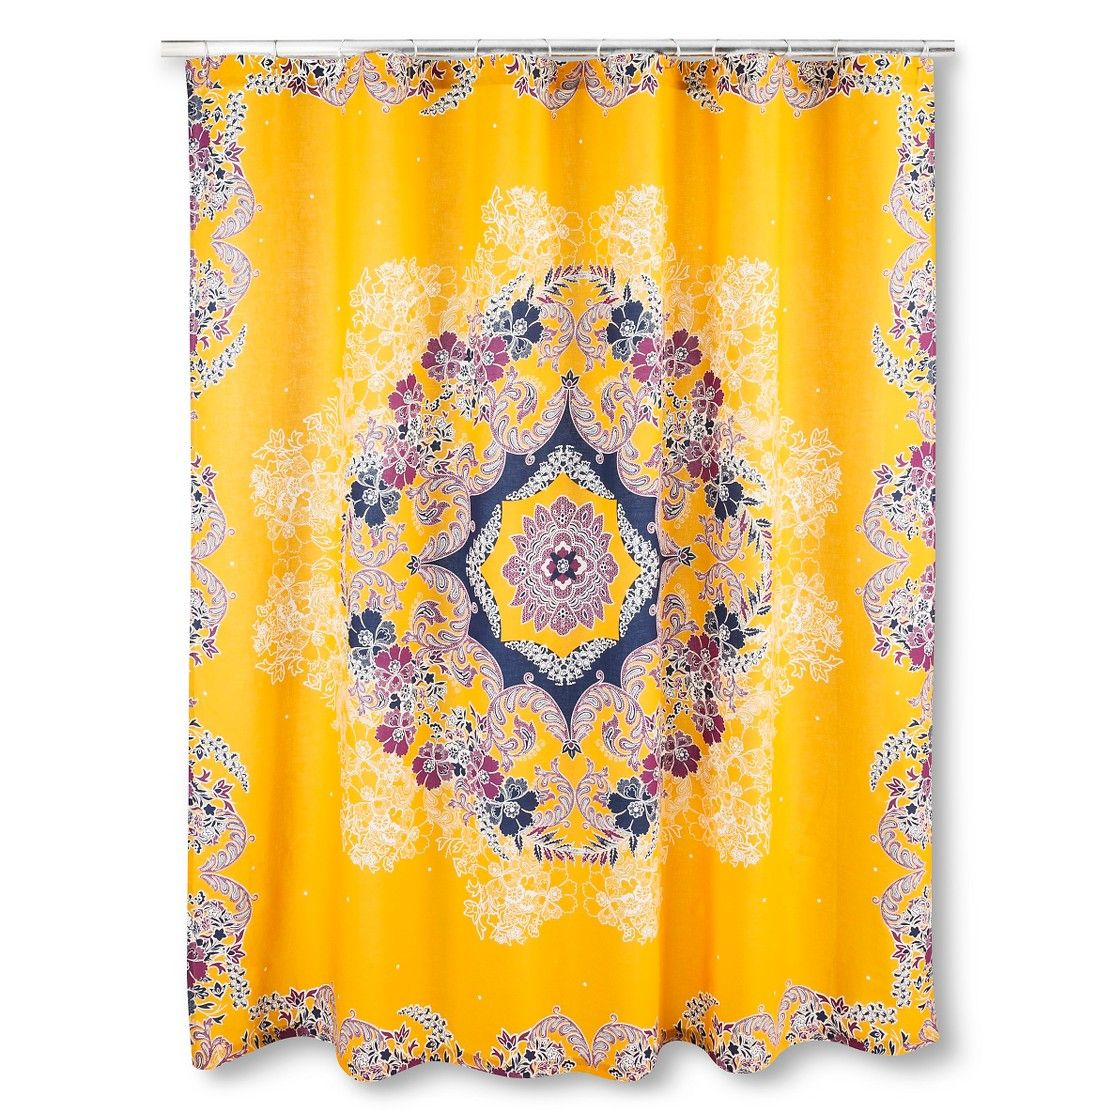 Boho Boutique Sueli Shower Curtain